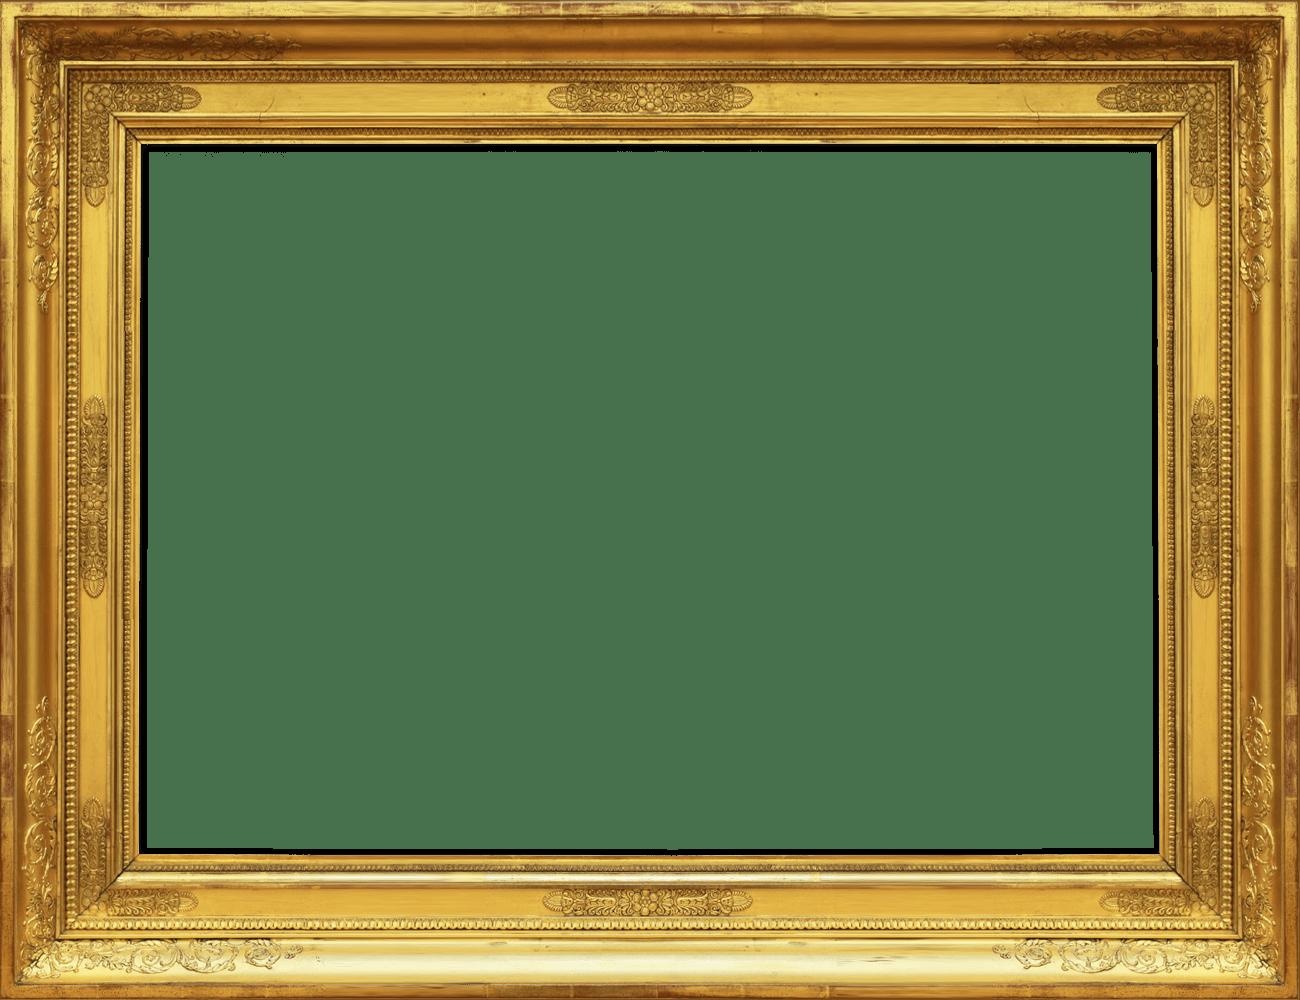 Frame PNG Free Download.